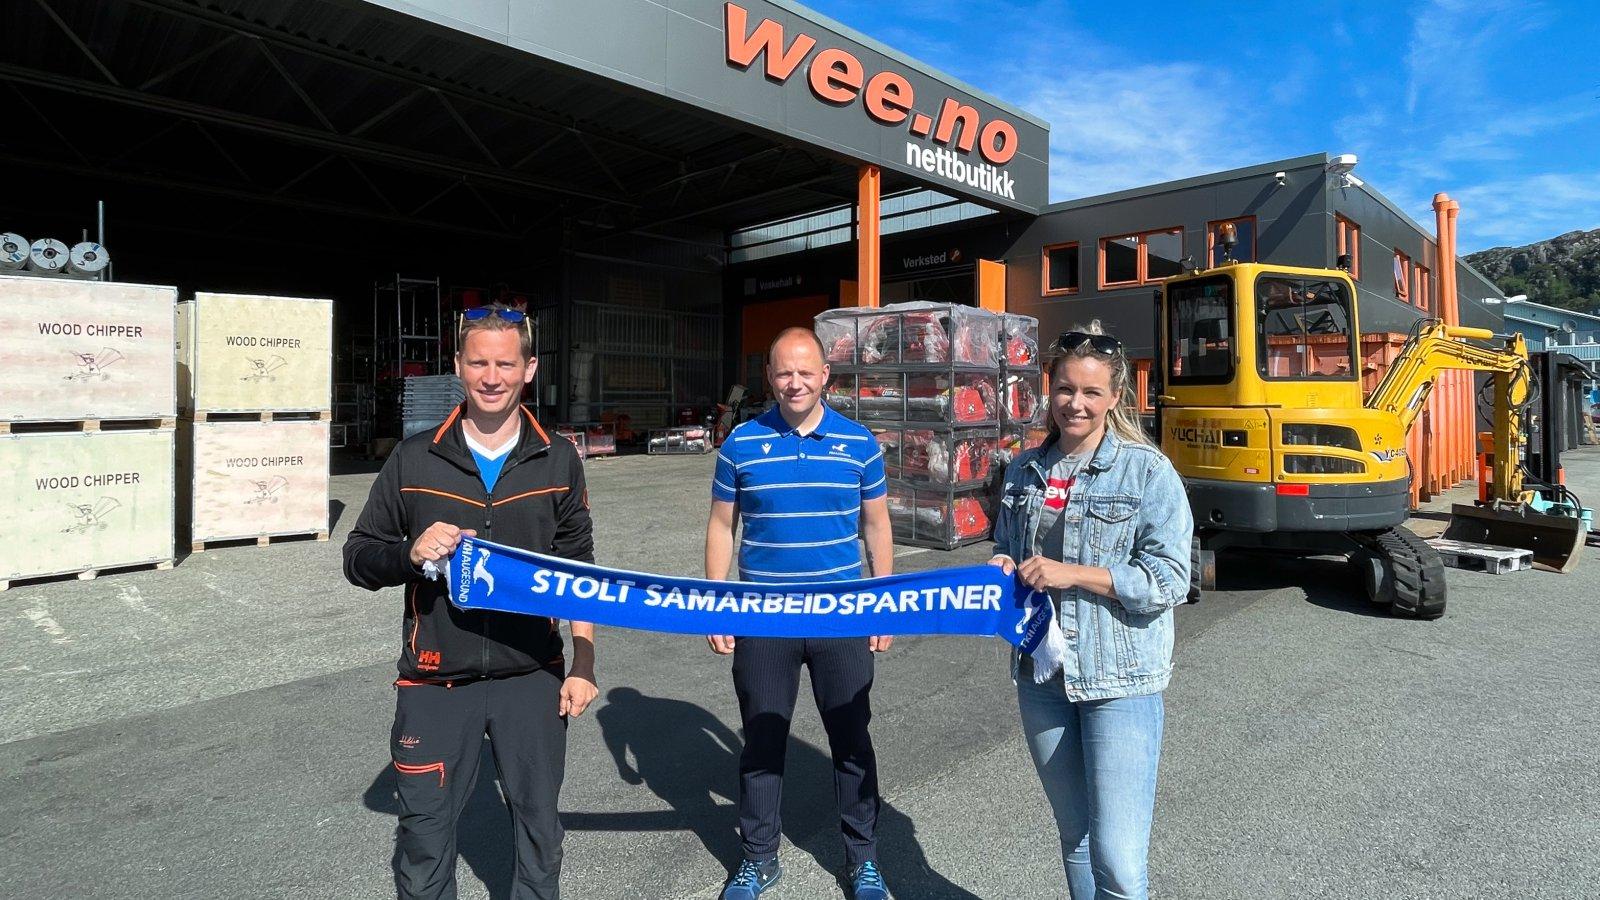 Fra venstre: Morten Wee, Martin Fauskanger og Vivian Wee Flatnes.